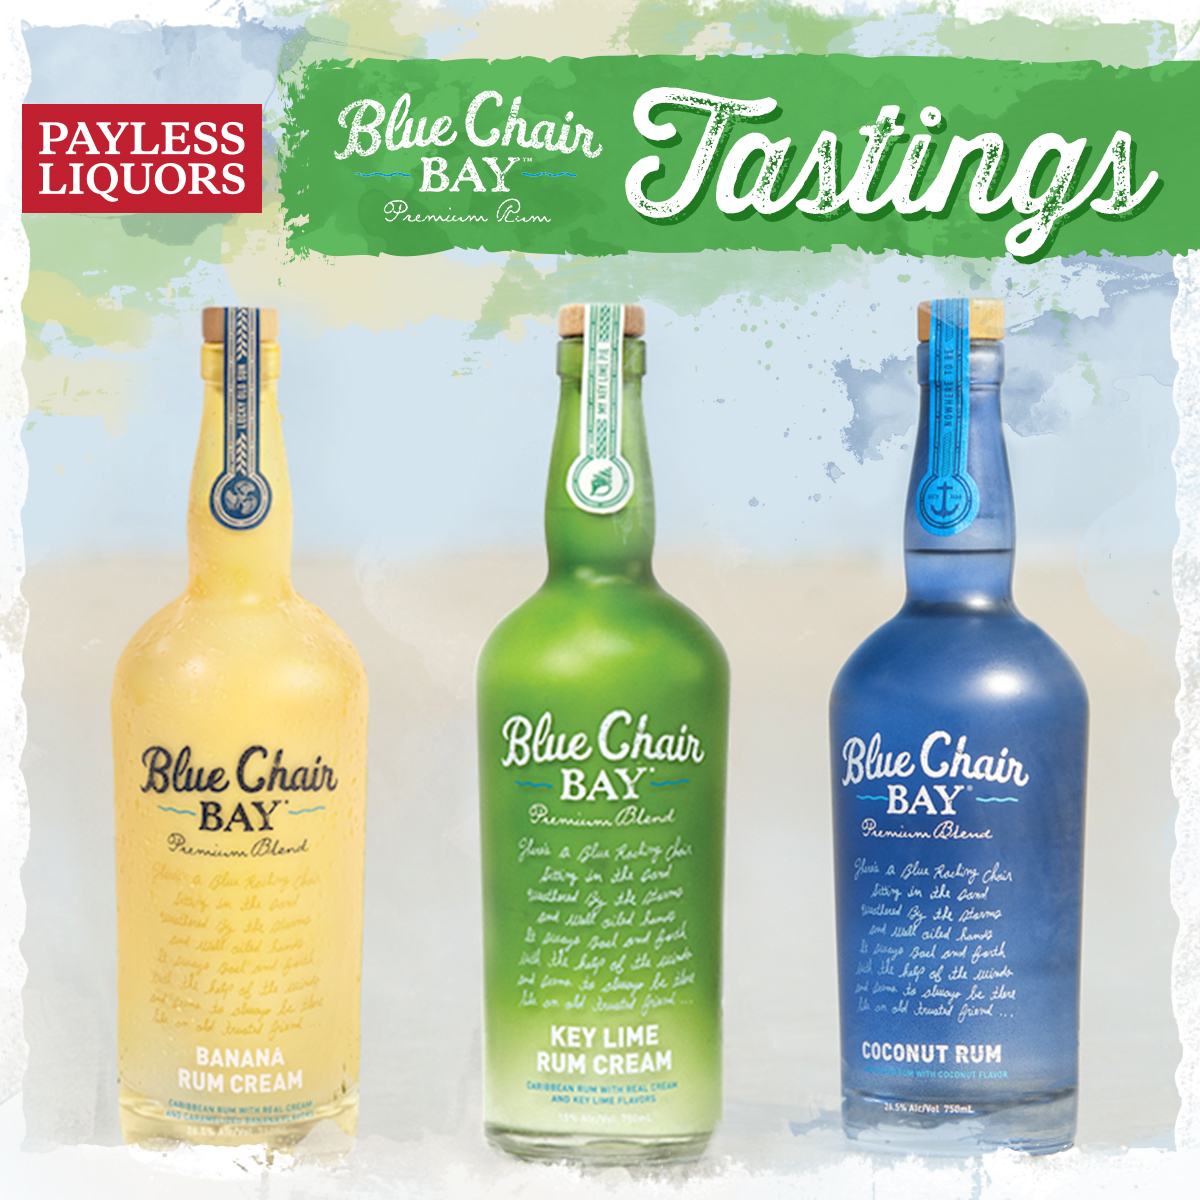 Blue Chair Bay Tasting  Carmel  Payless Liquors